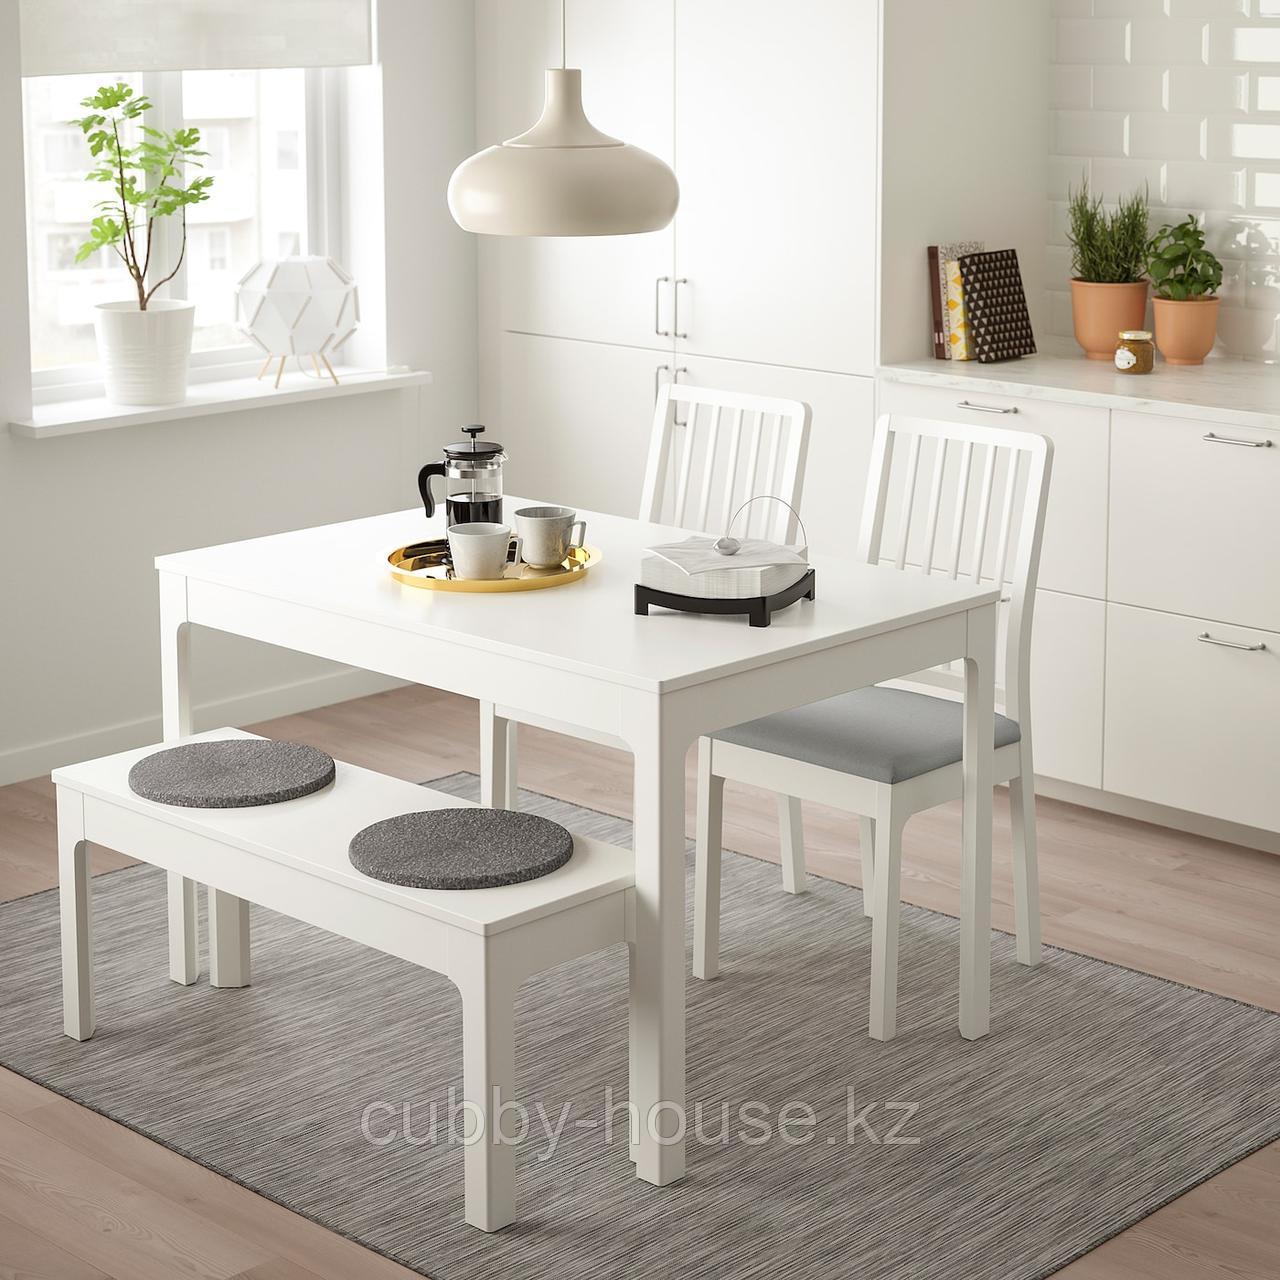 БЕРТИЛЬ Подушка на стул, серый, 33 см - фото 3